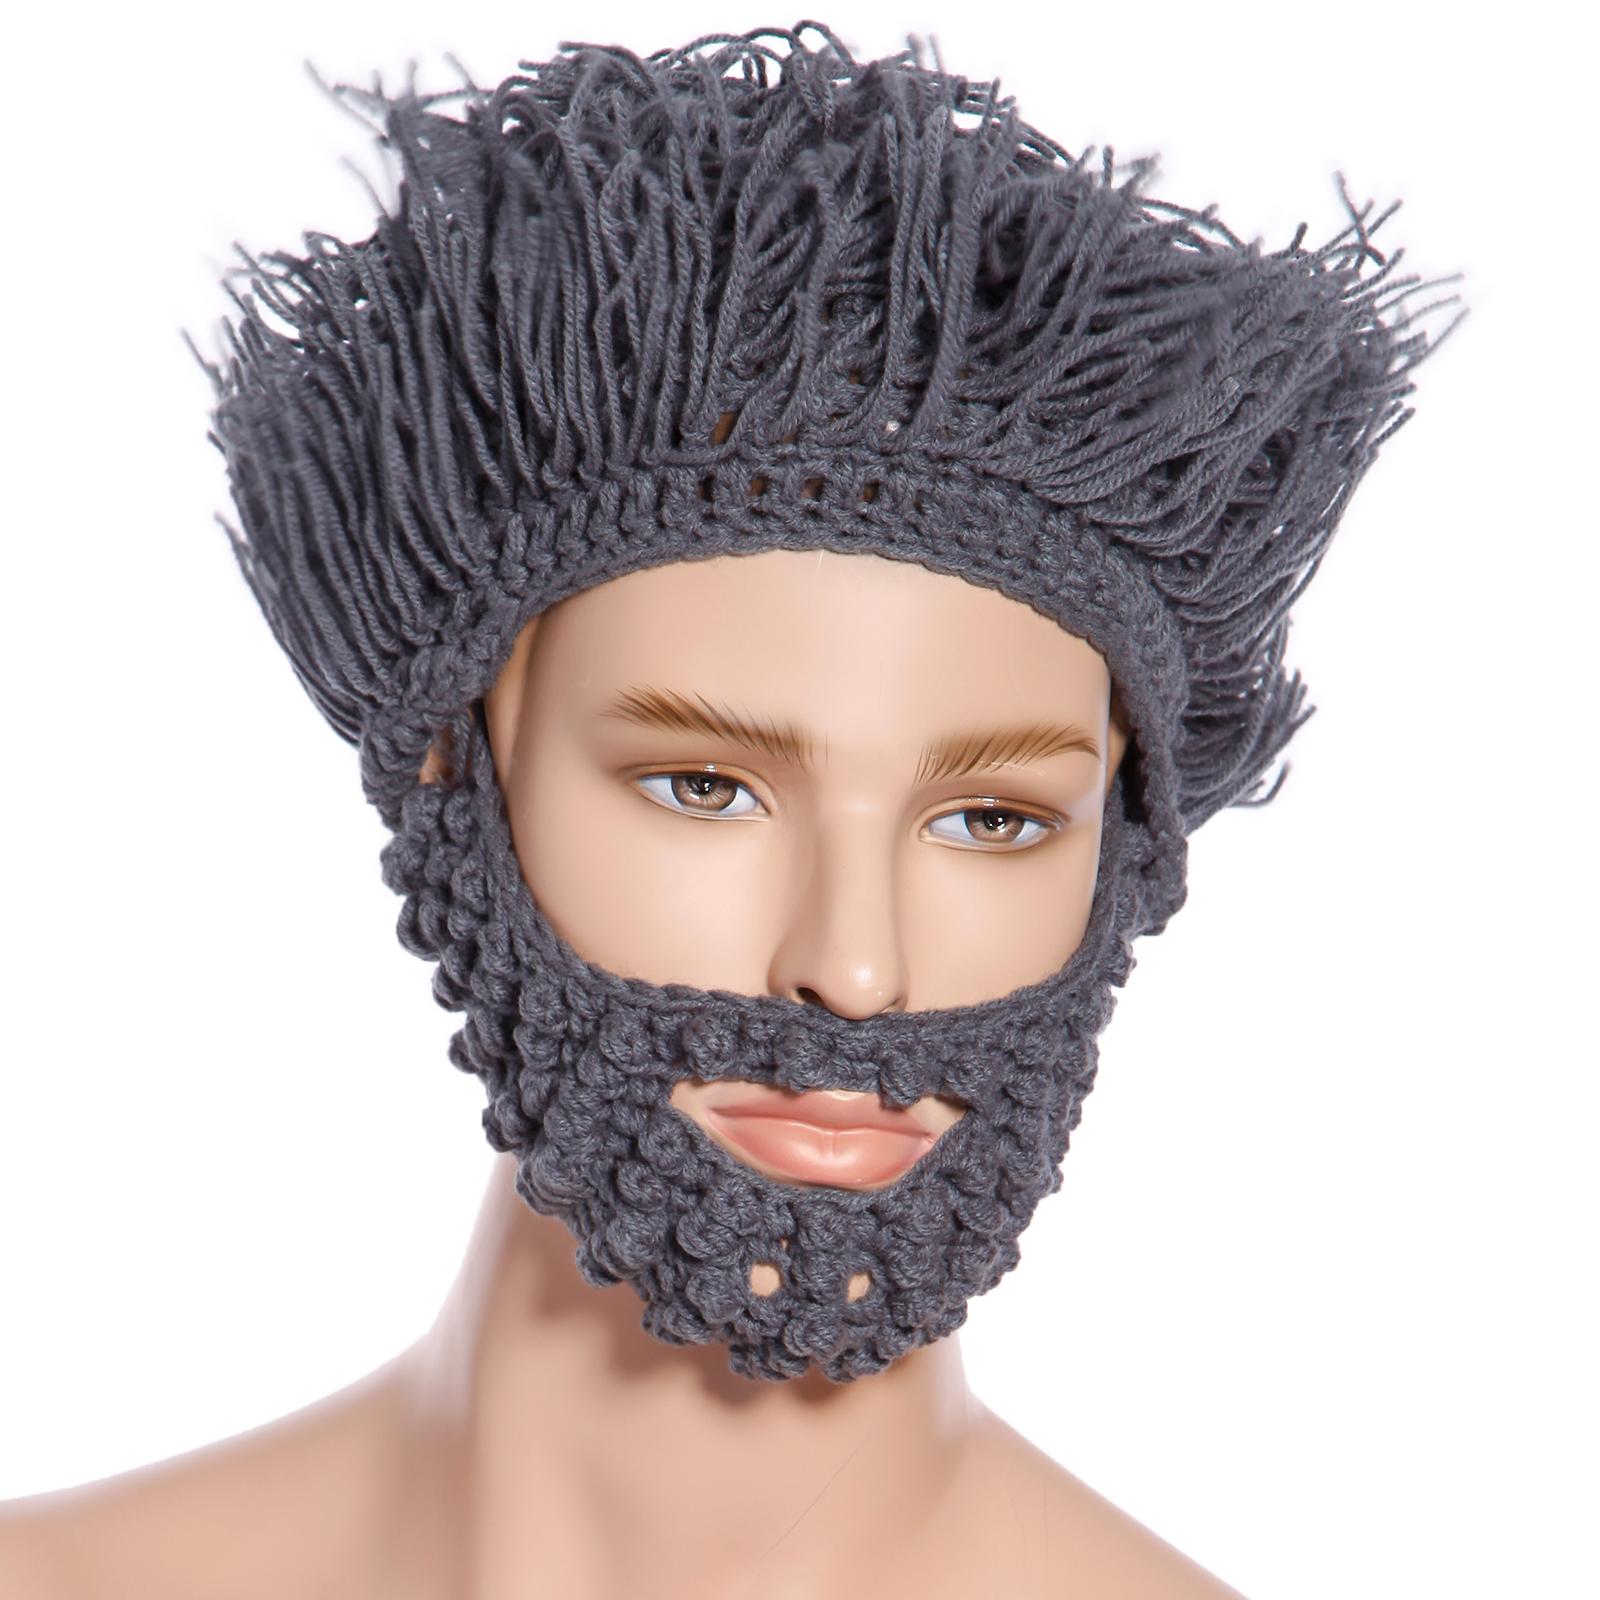 unisex m tze kappe strickm tze winterm tze mit maske per cke bart bartm tze ebay. Black Bedroom Furniture Sets. Home Design Ideas